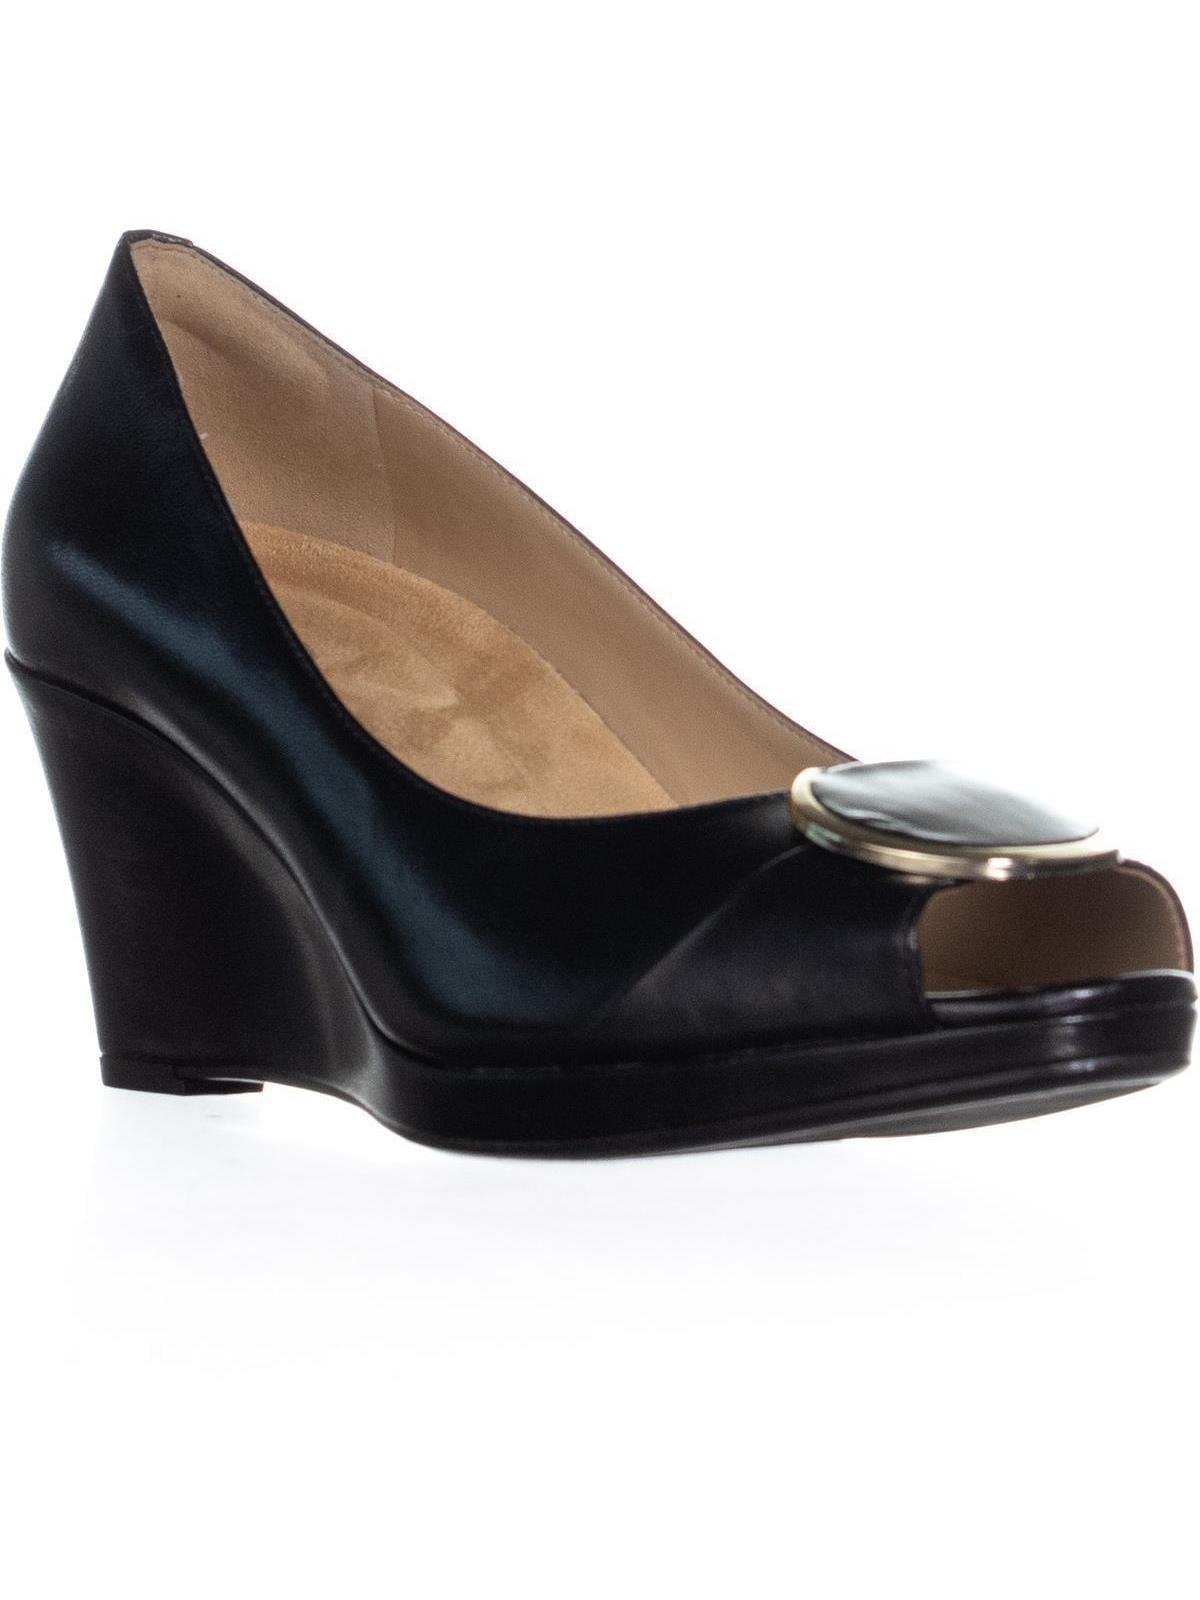 0b8699f4a381 naturalizer - Womens naturalizer Ollie Peep Toe Wedge Heels